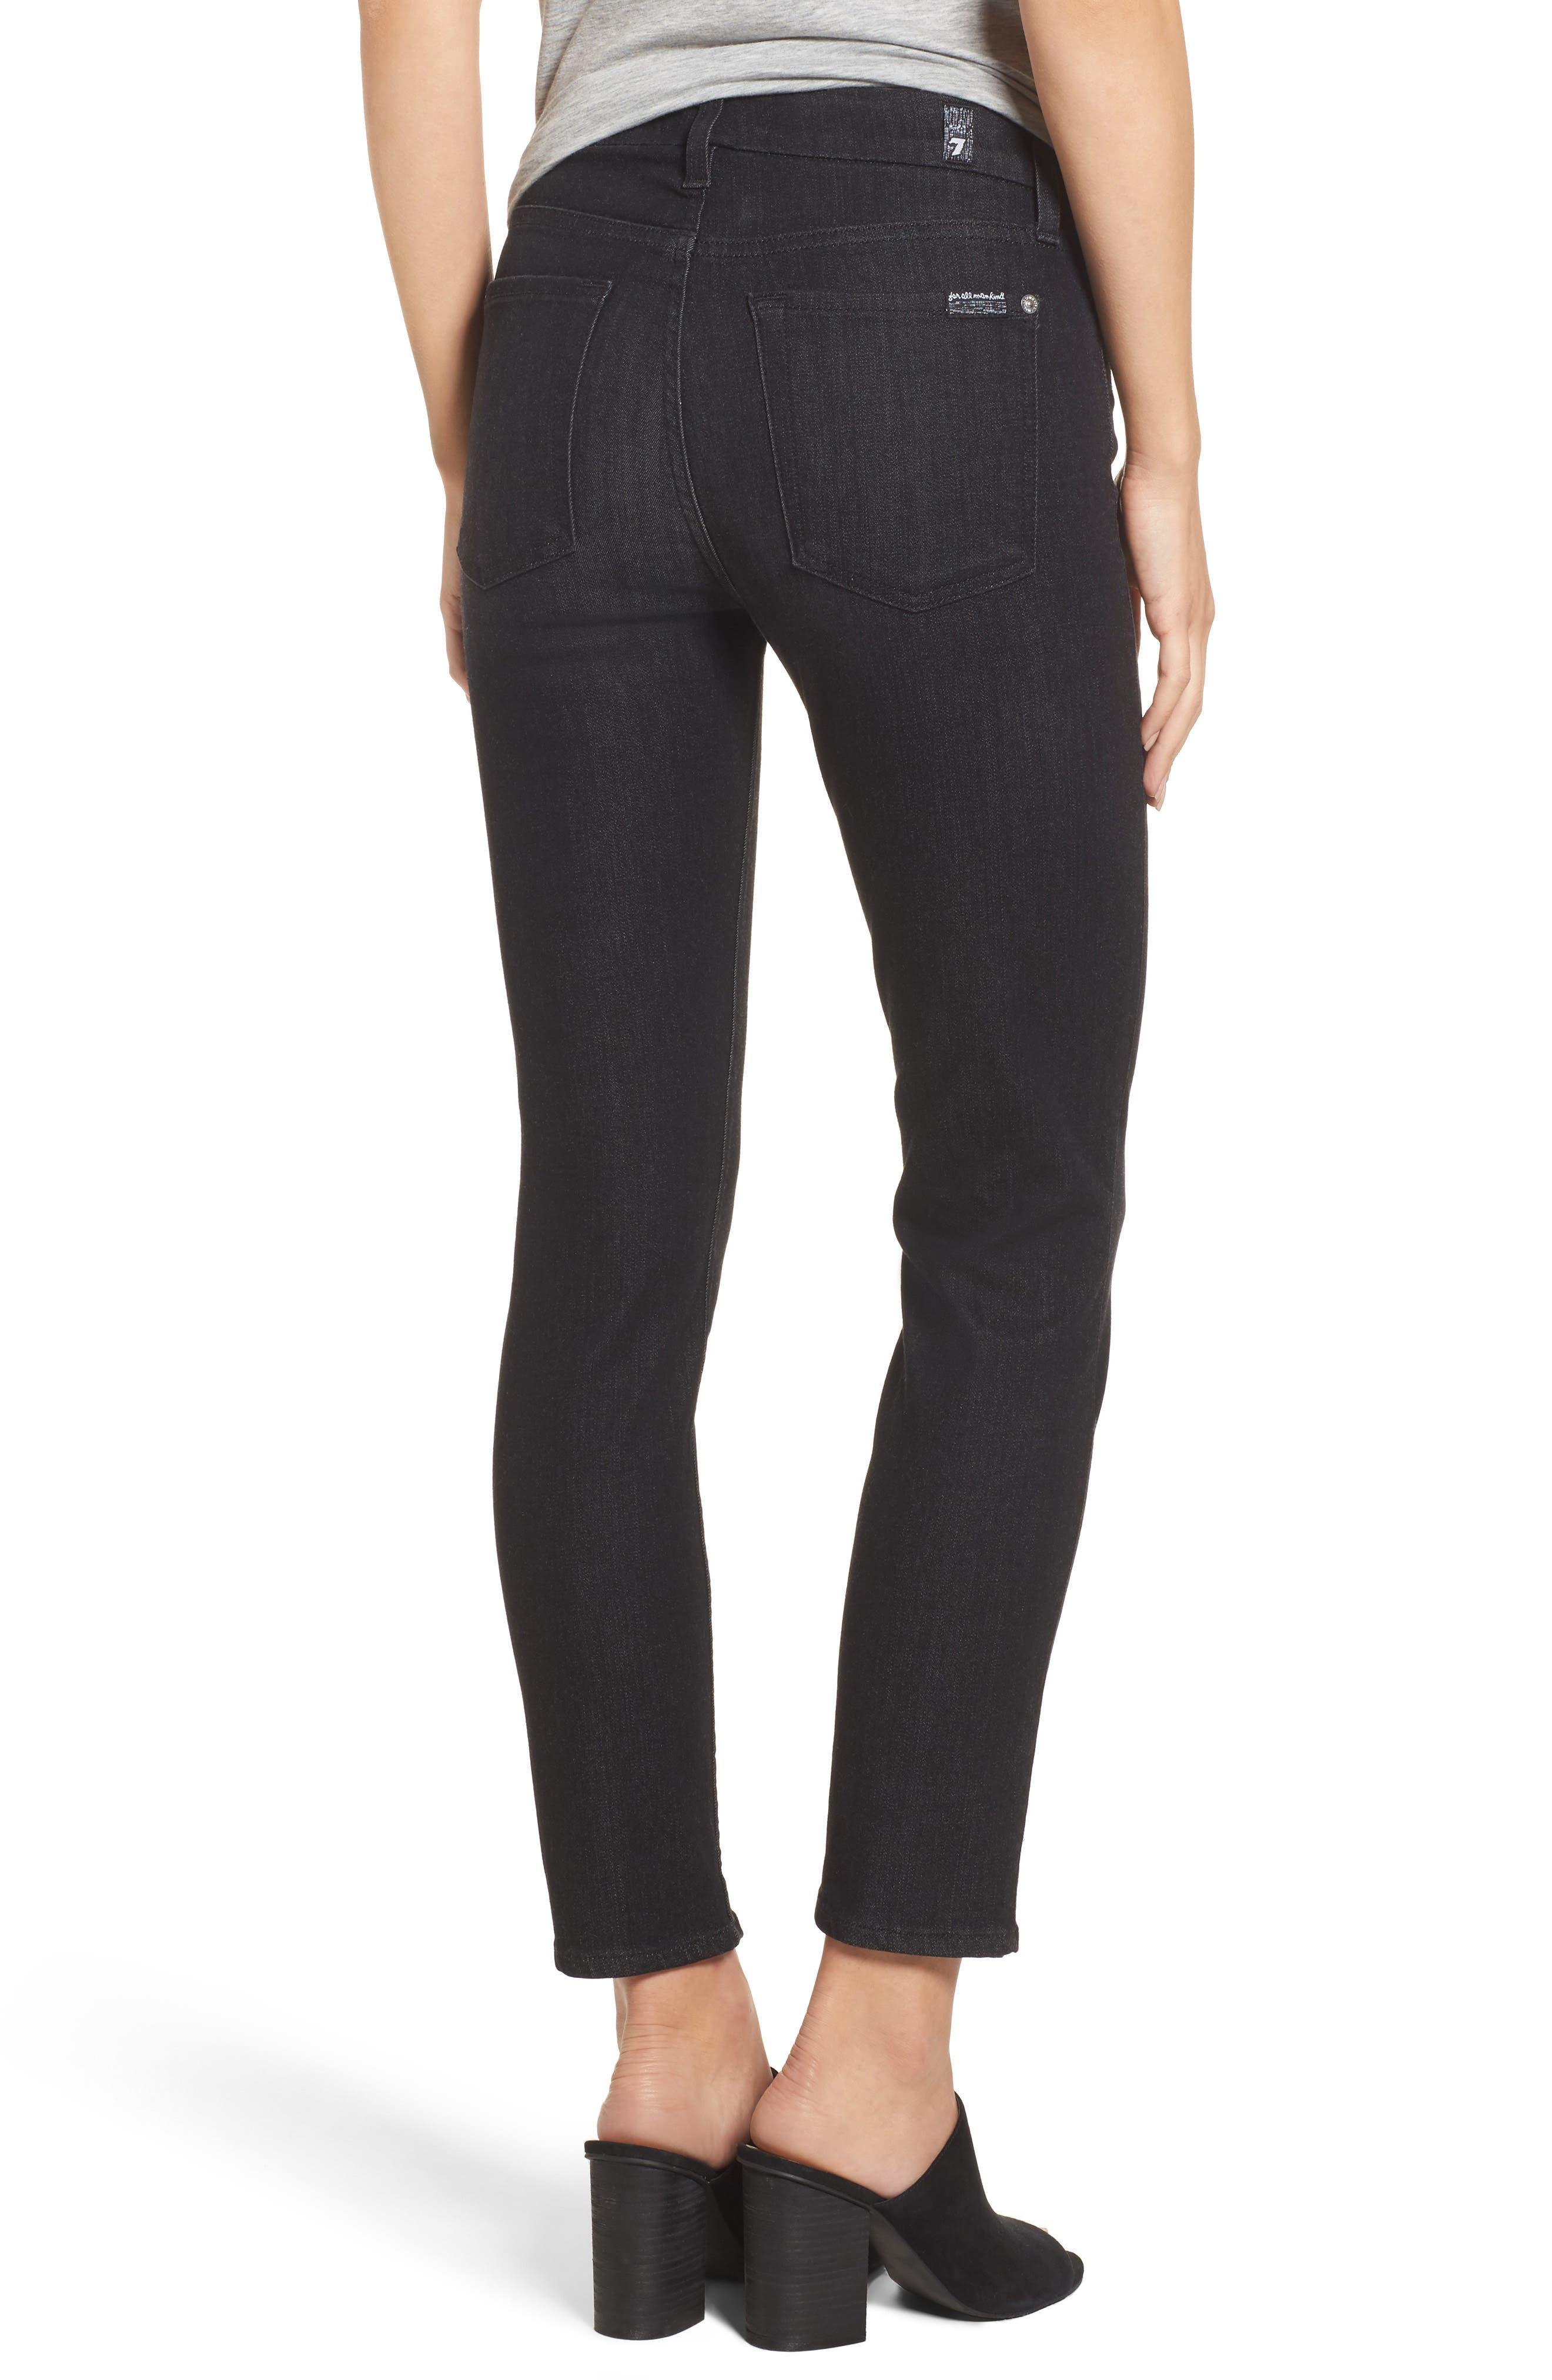 b(air) - Roxanne Ankle Zip Jeans,                             Alternate thumbnail 2, color,                             Bair Noir